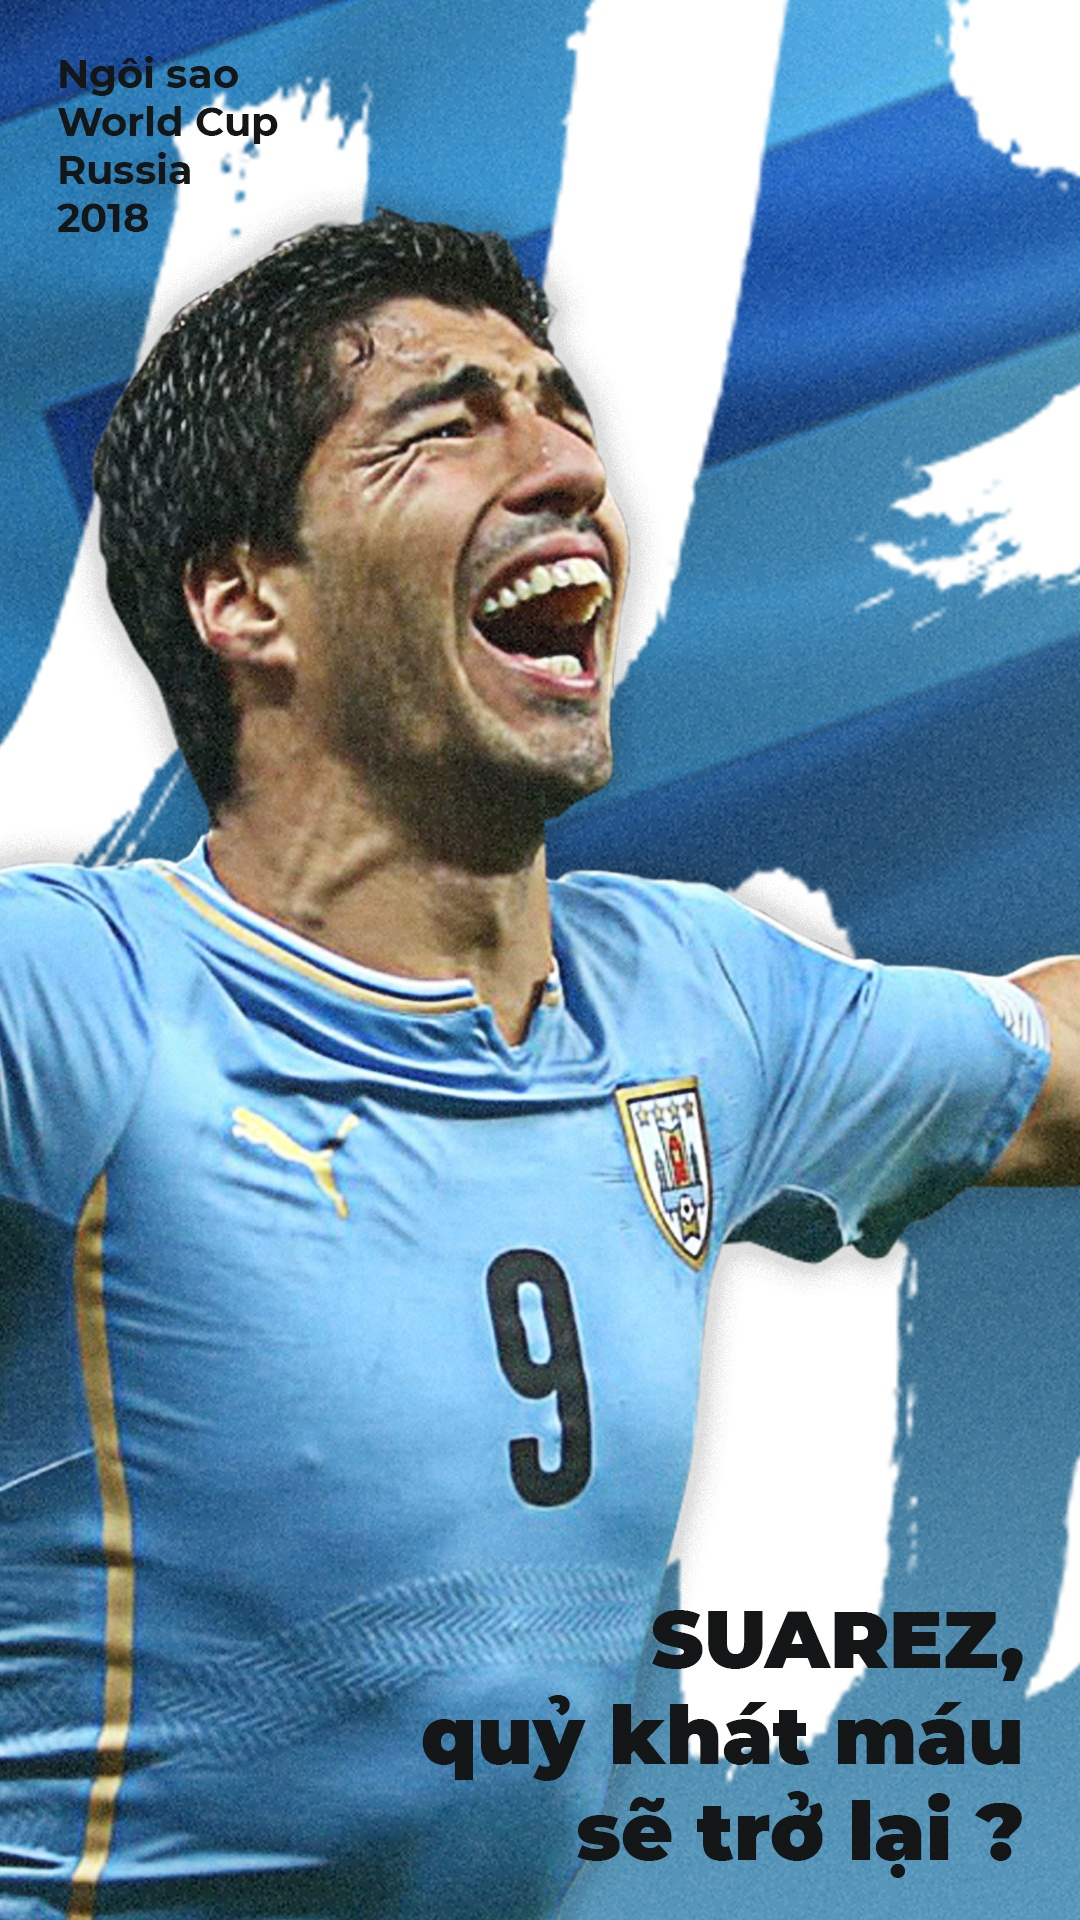 Bo mat nao cho Luis Suarez o World Cup 2018 anh 1